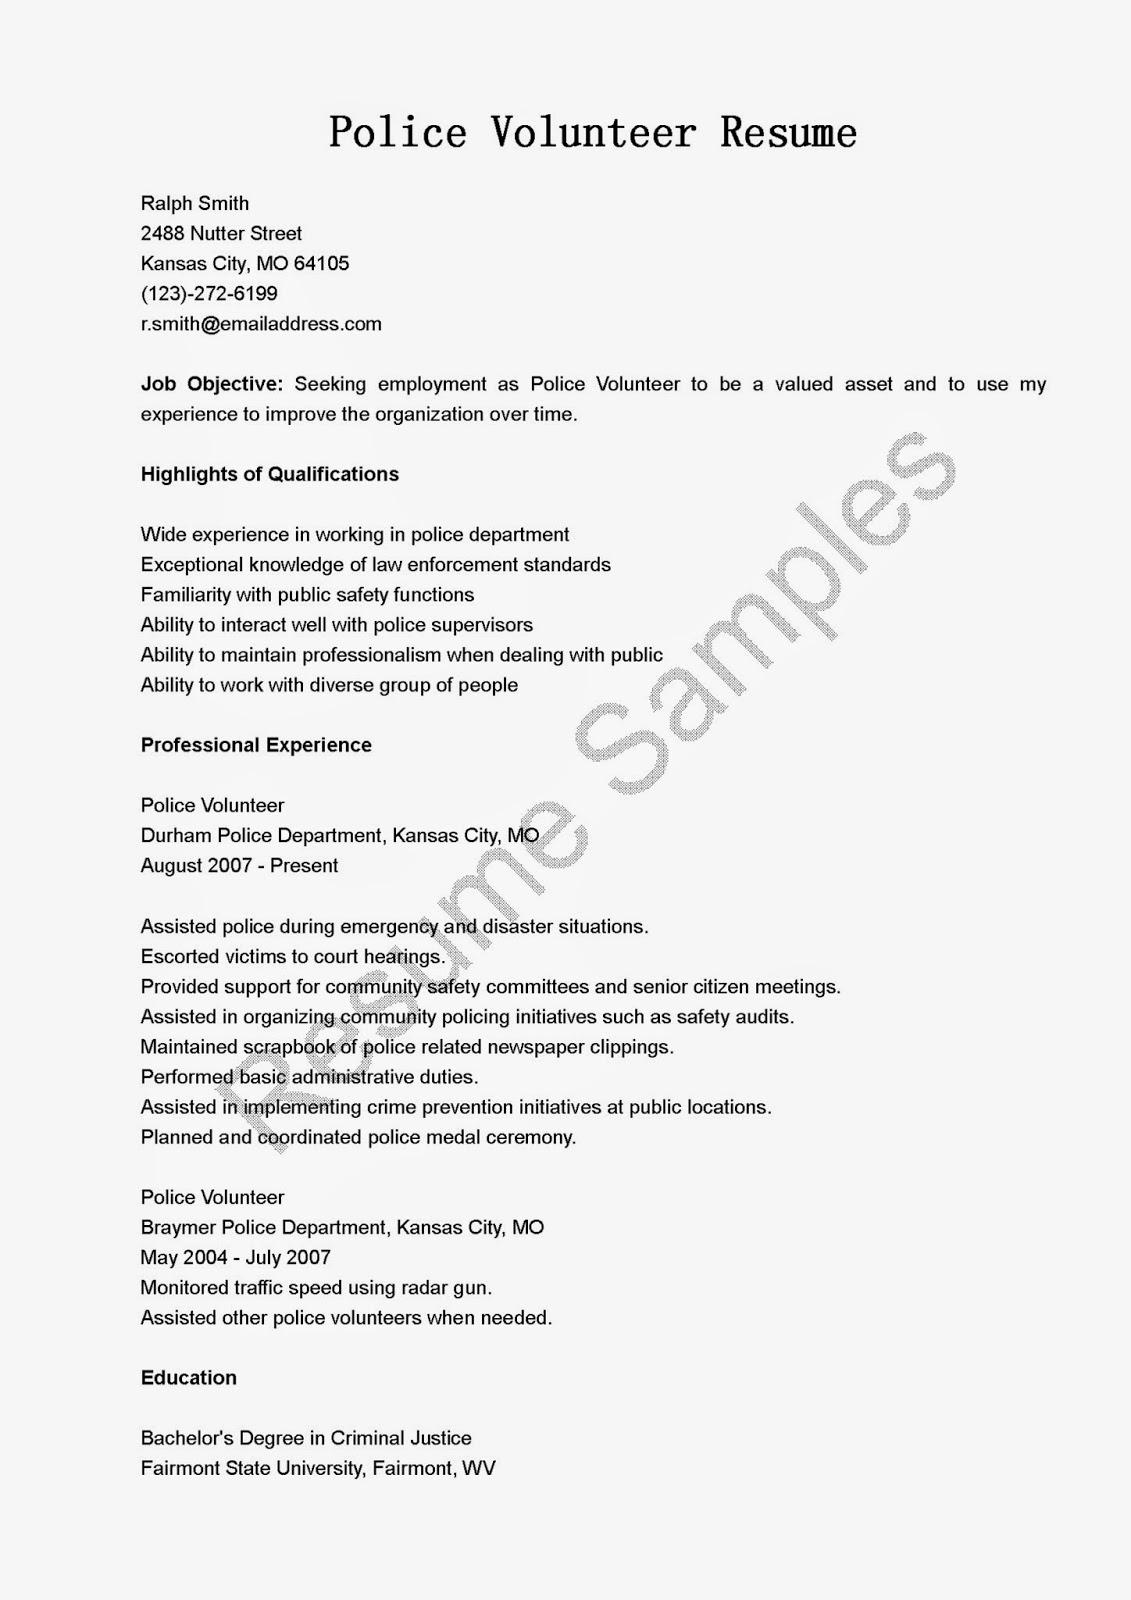 Sample Resume for a MilitarytoCivilian Transition